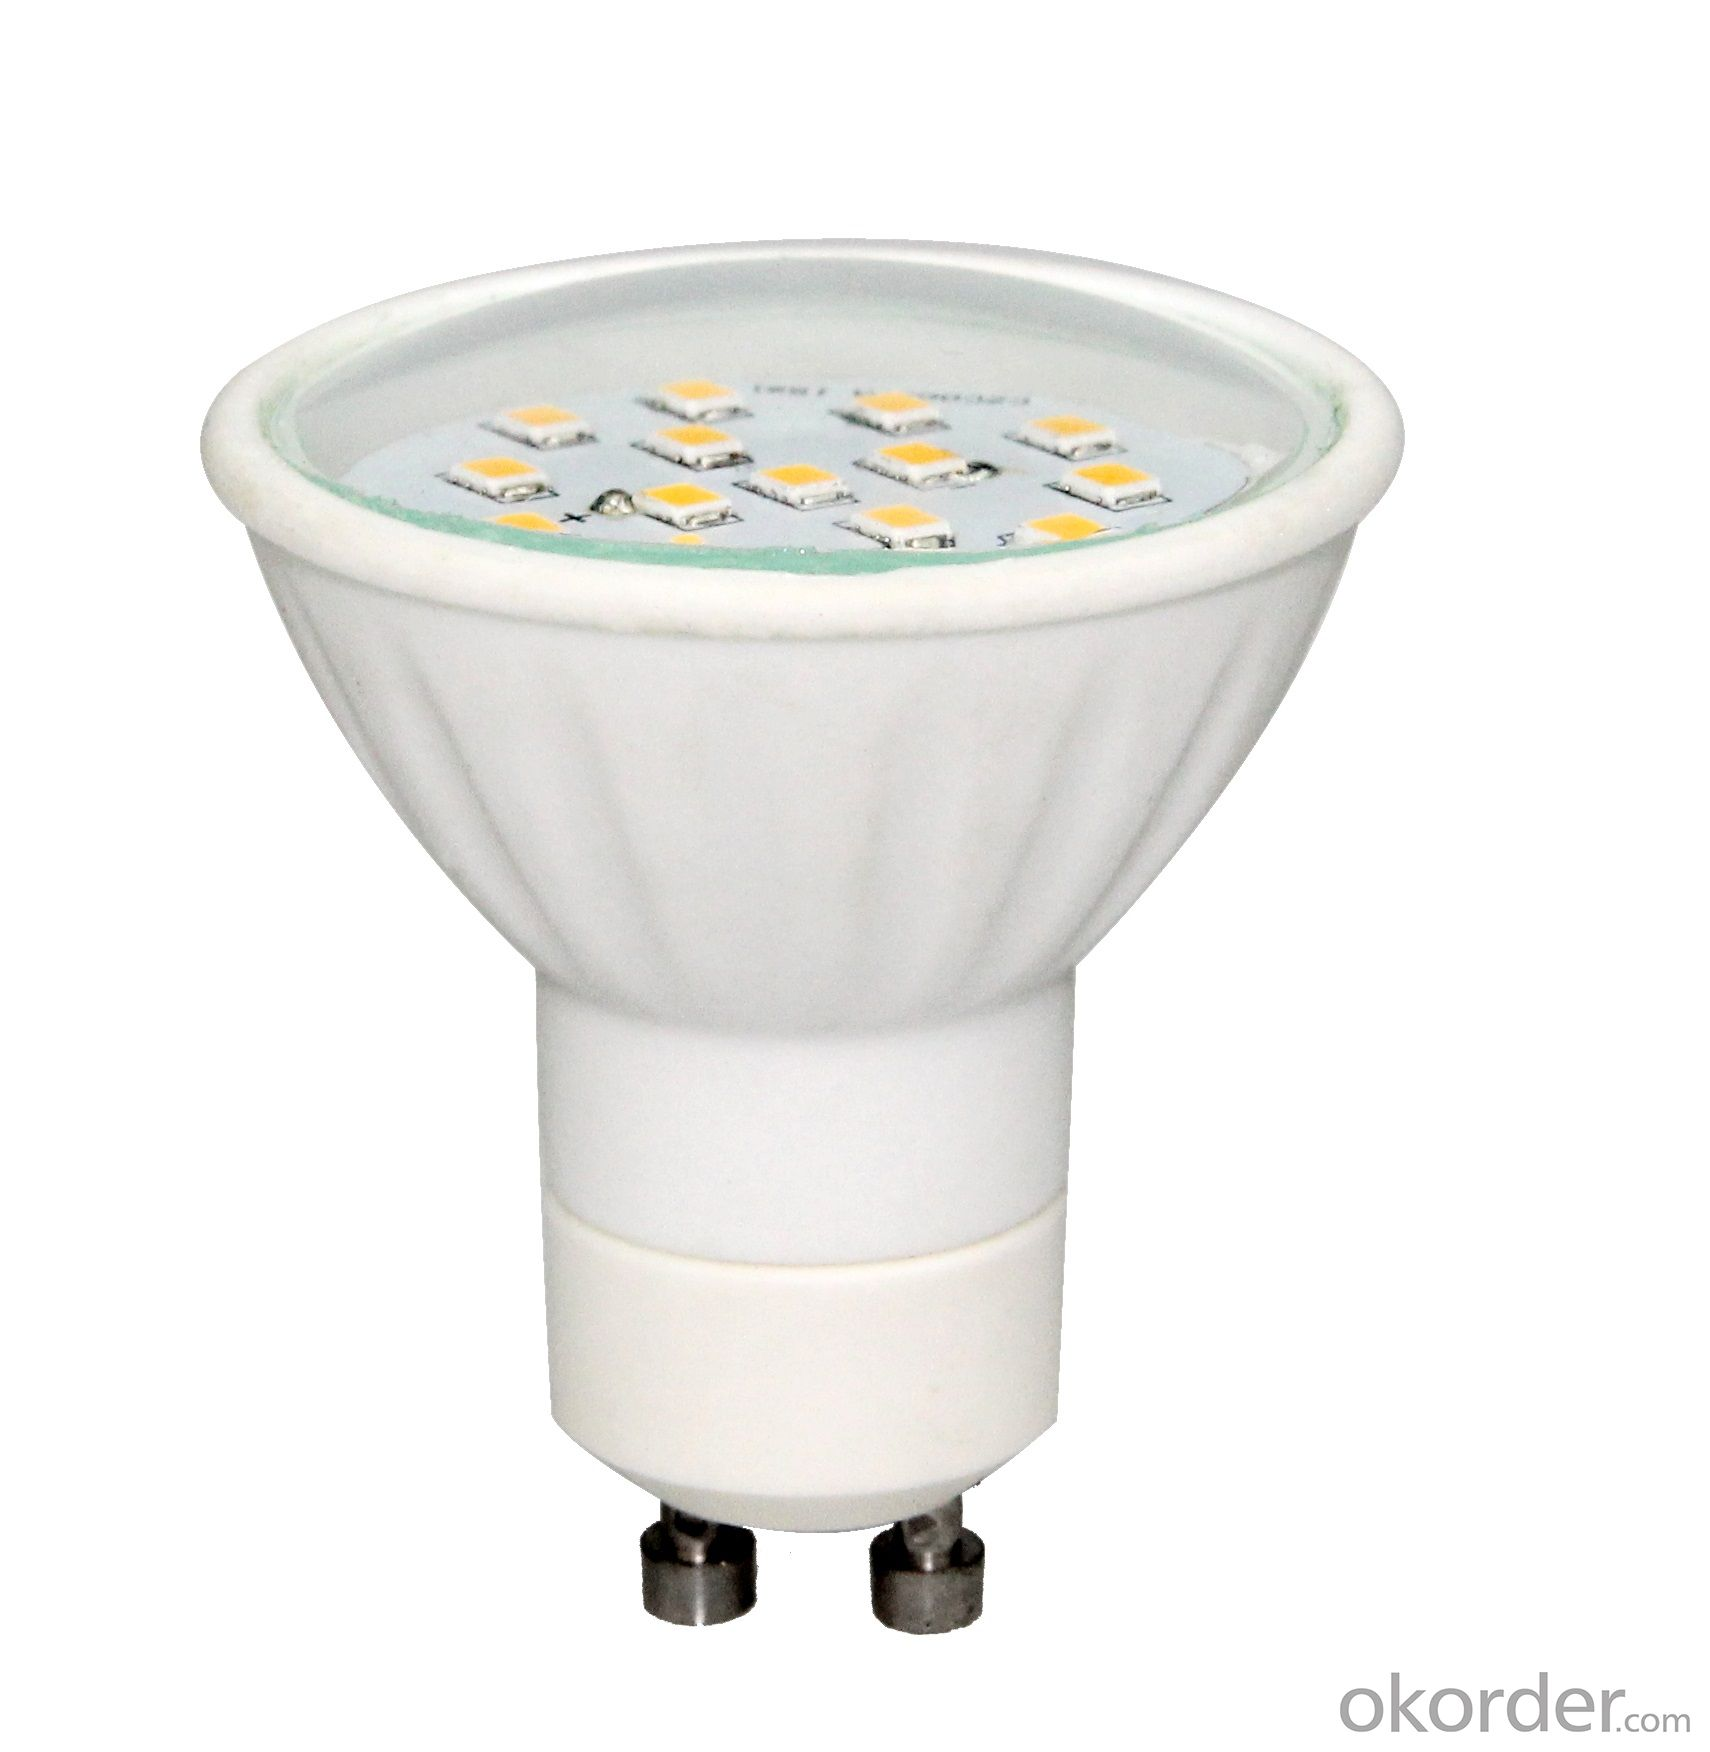 LED    Spotlight    GU10-PL022-AL563016D-8W